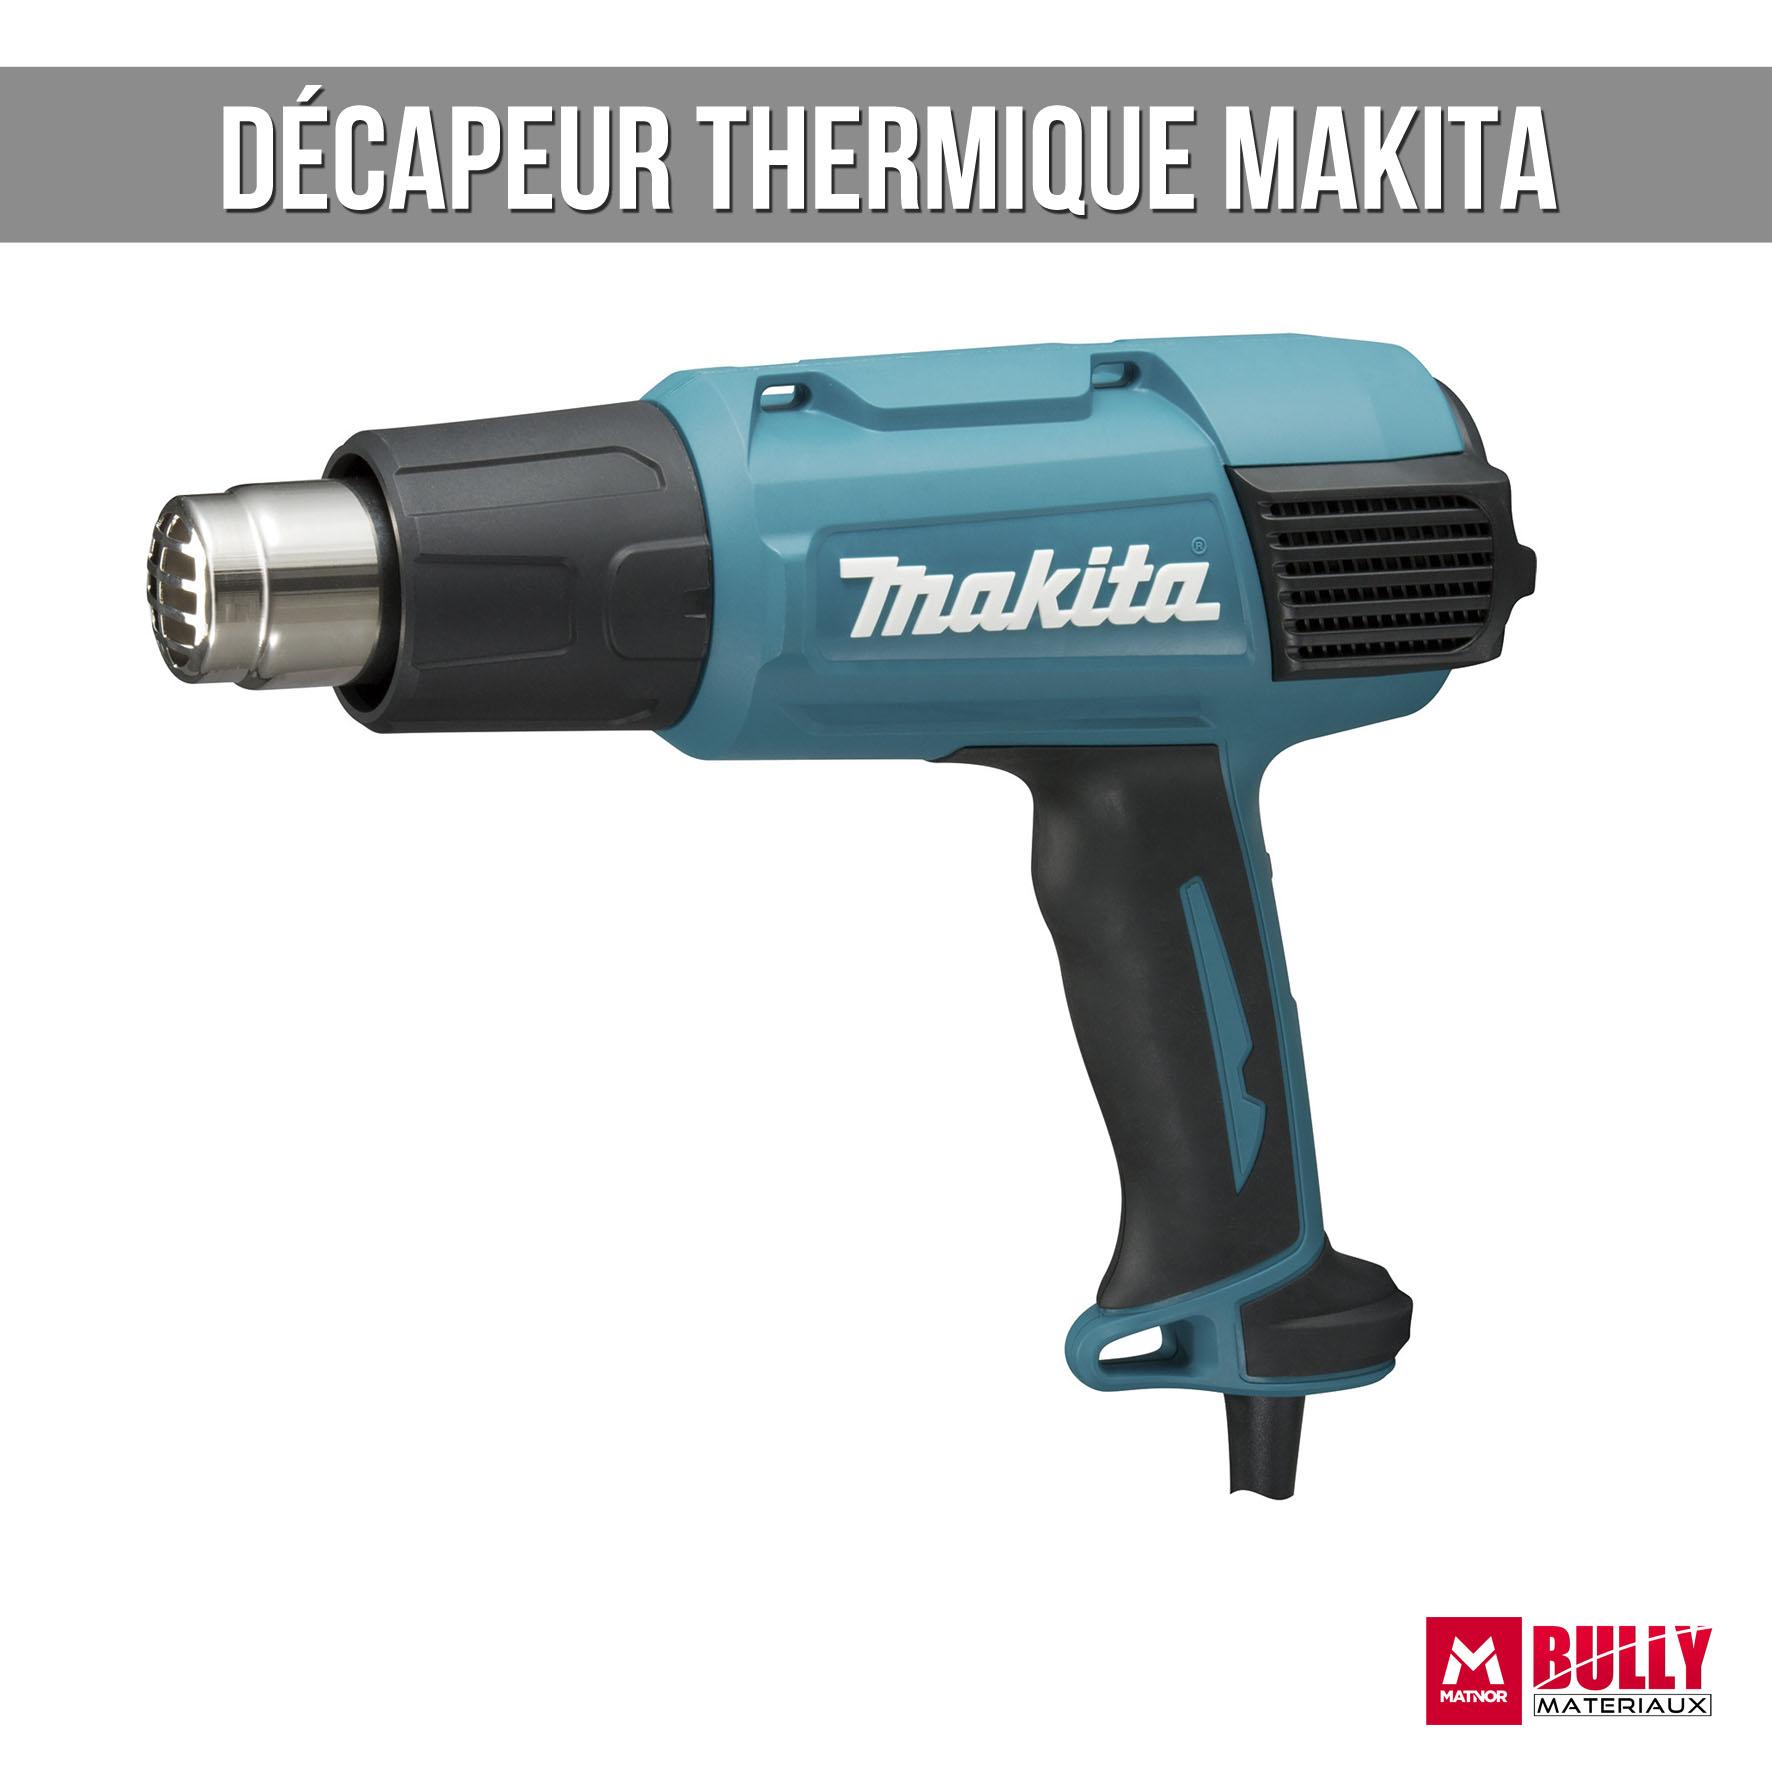 Decapeur thermique makita